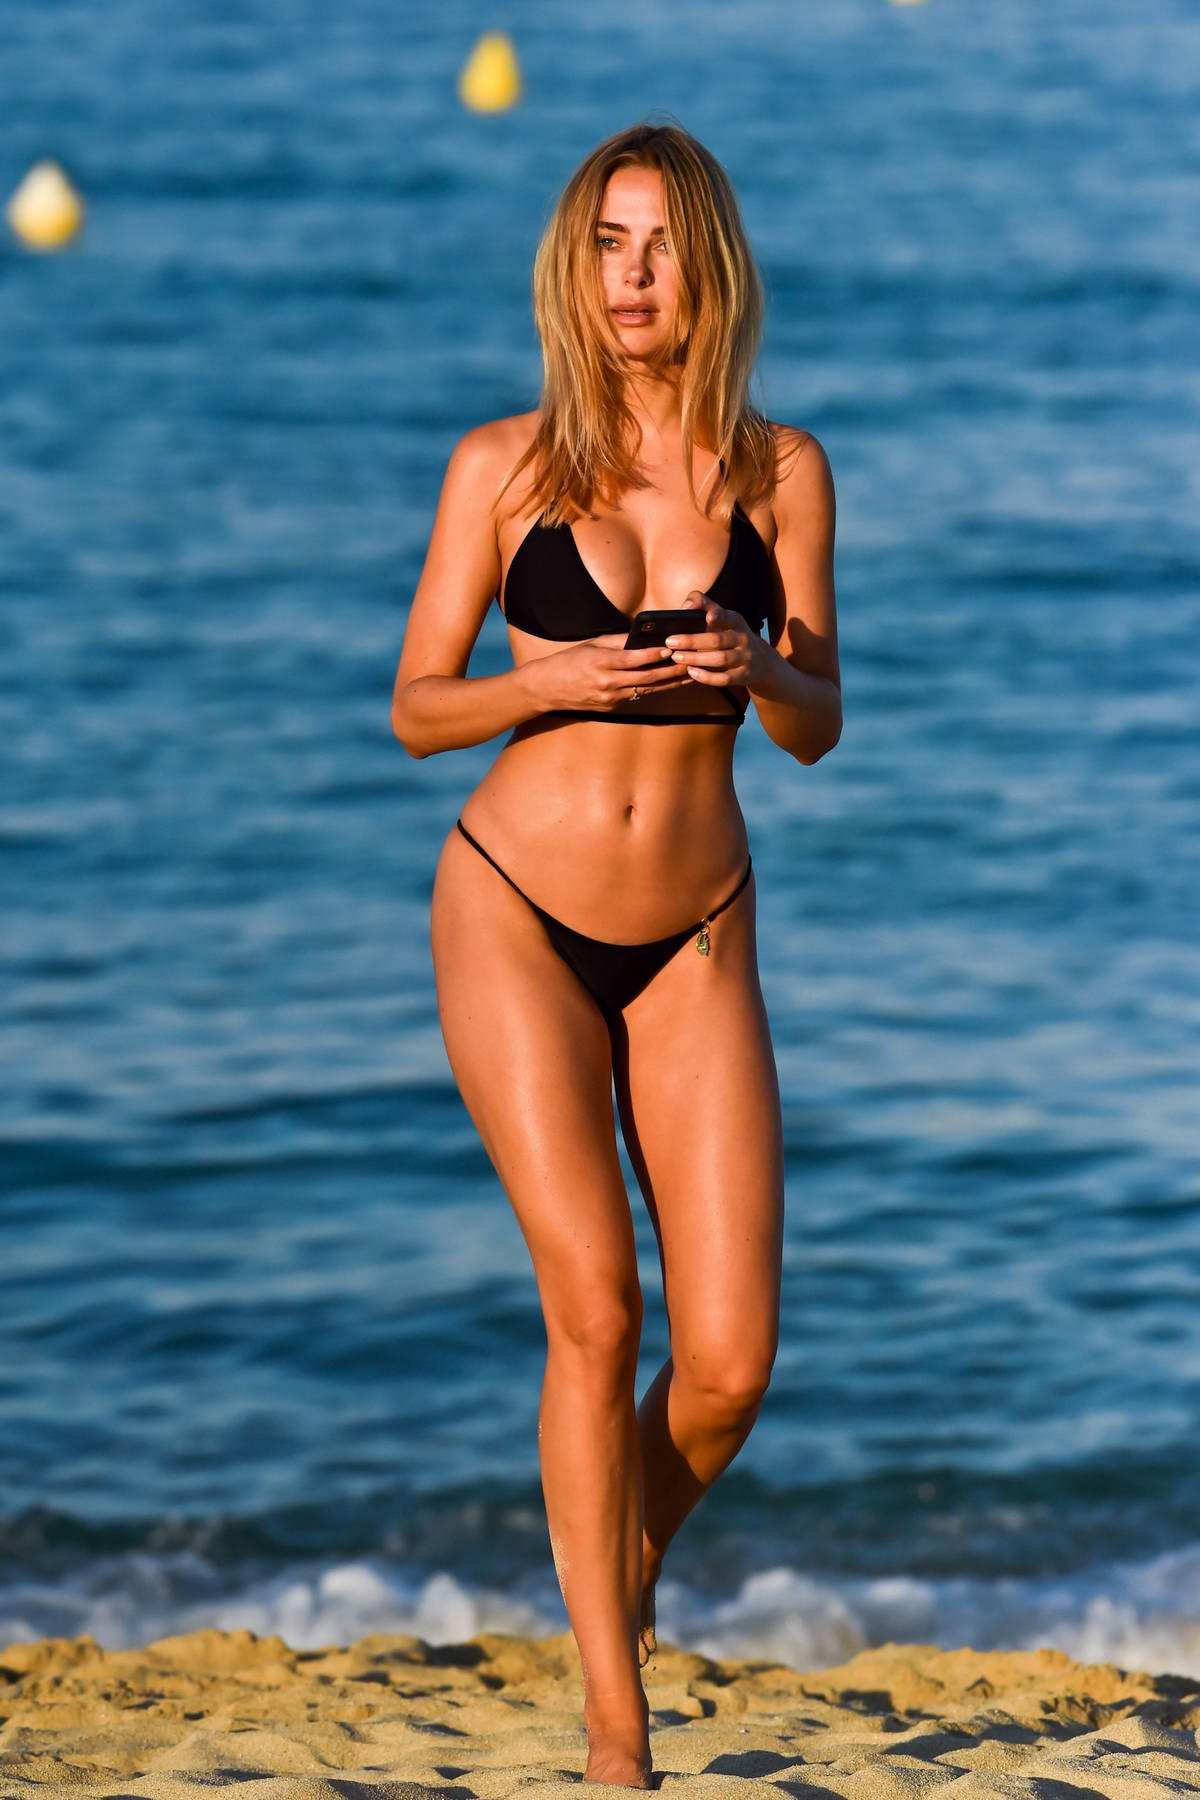 Kimberley Garner stuns in a black bikini as she hits the beach while on holiday in Miami, Florida